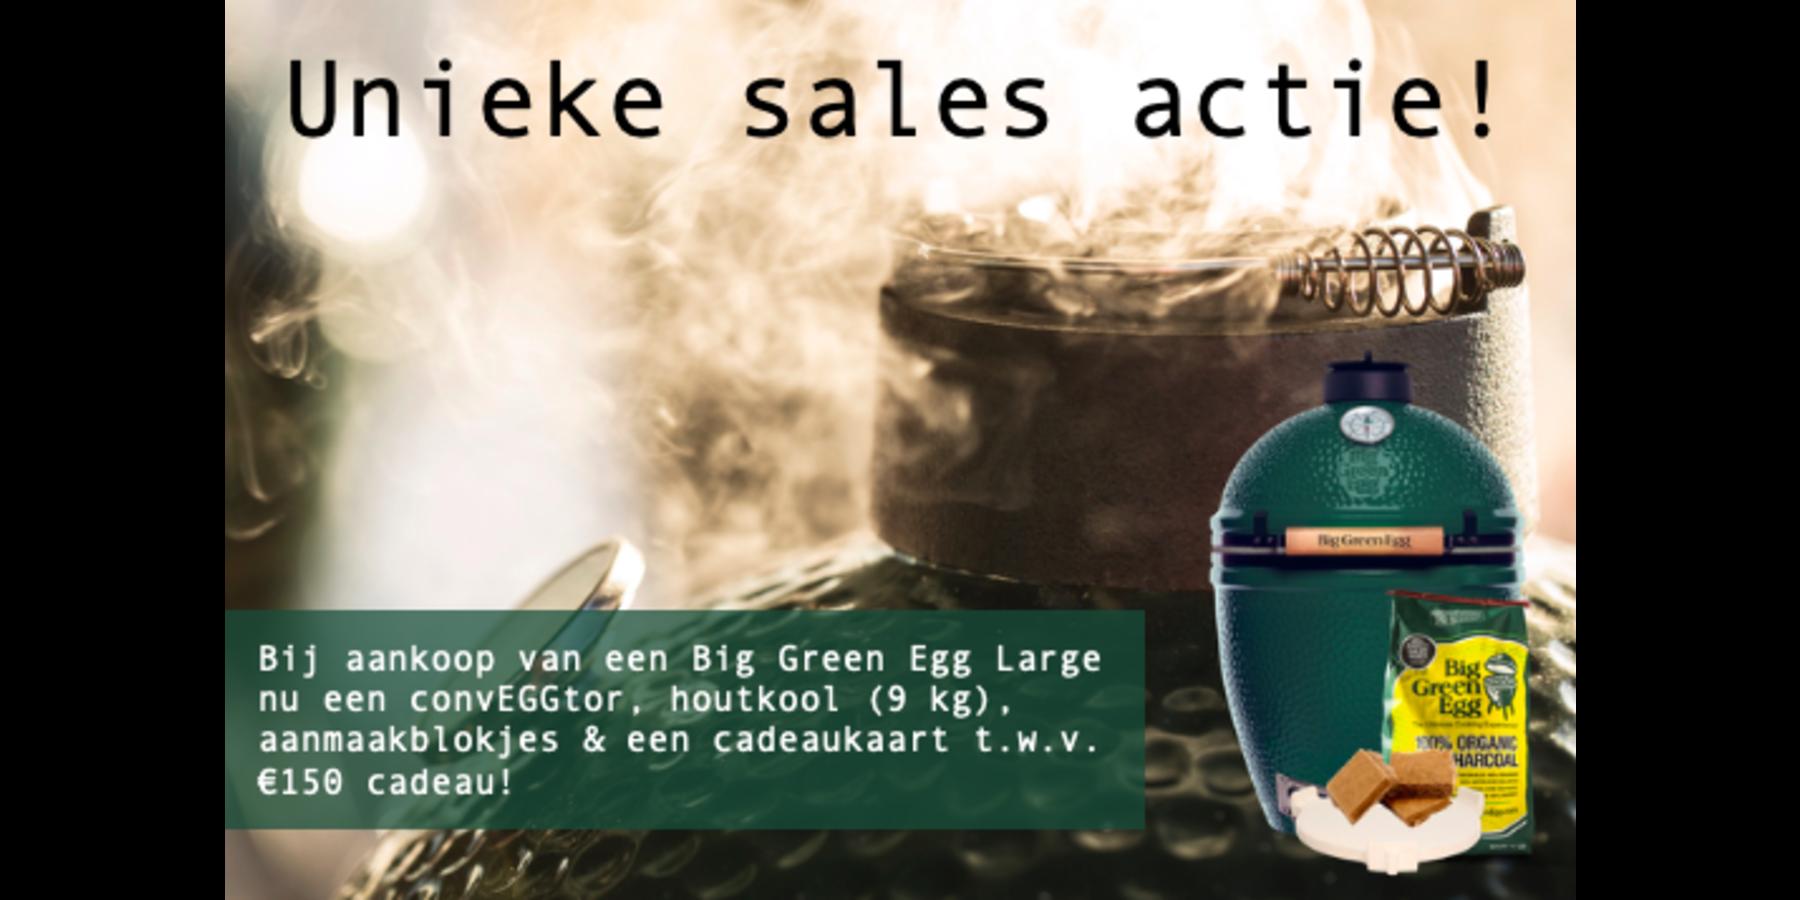 Unieke sales actie BGE Large